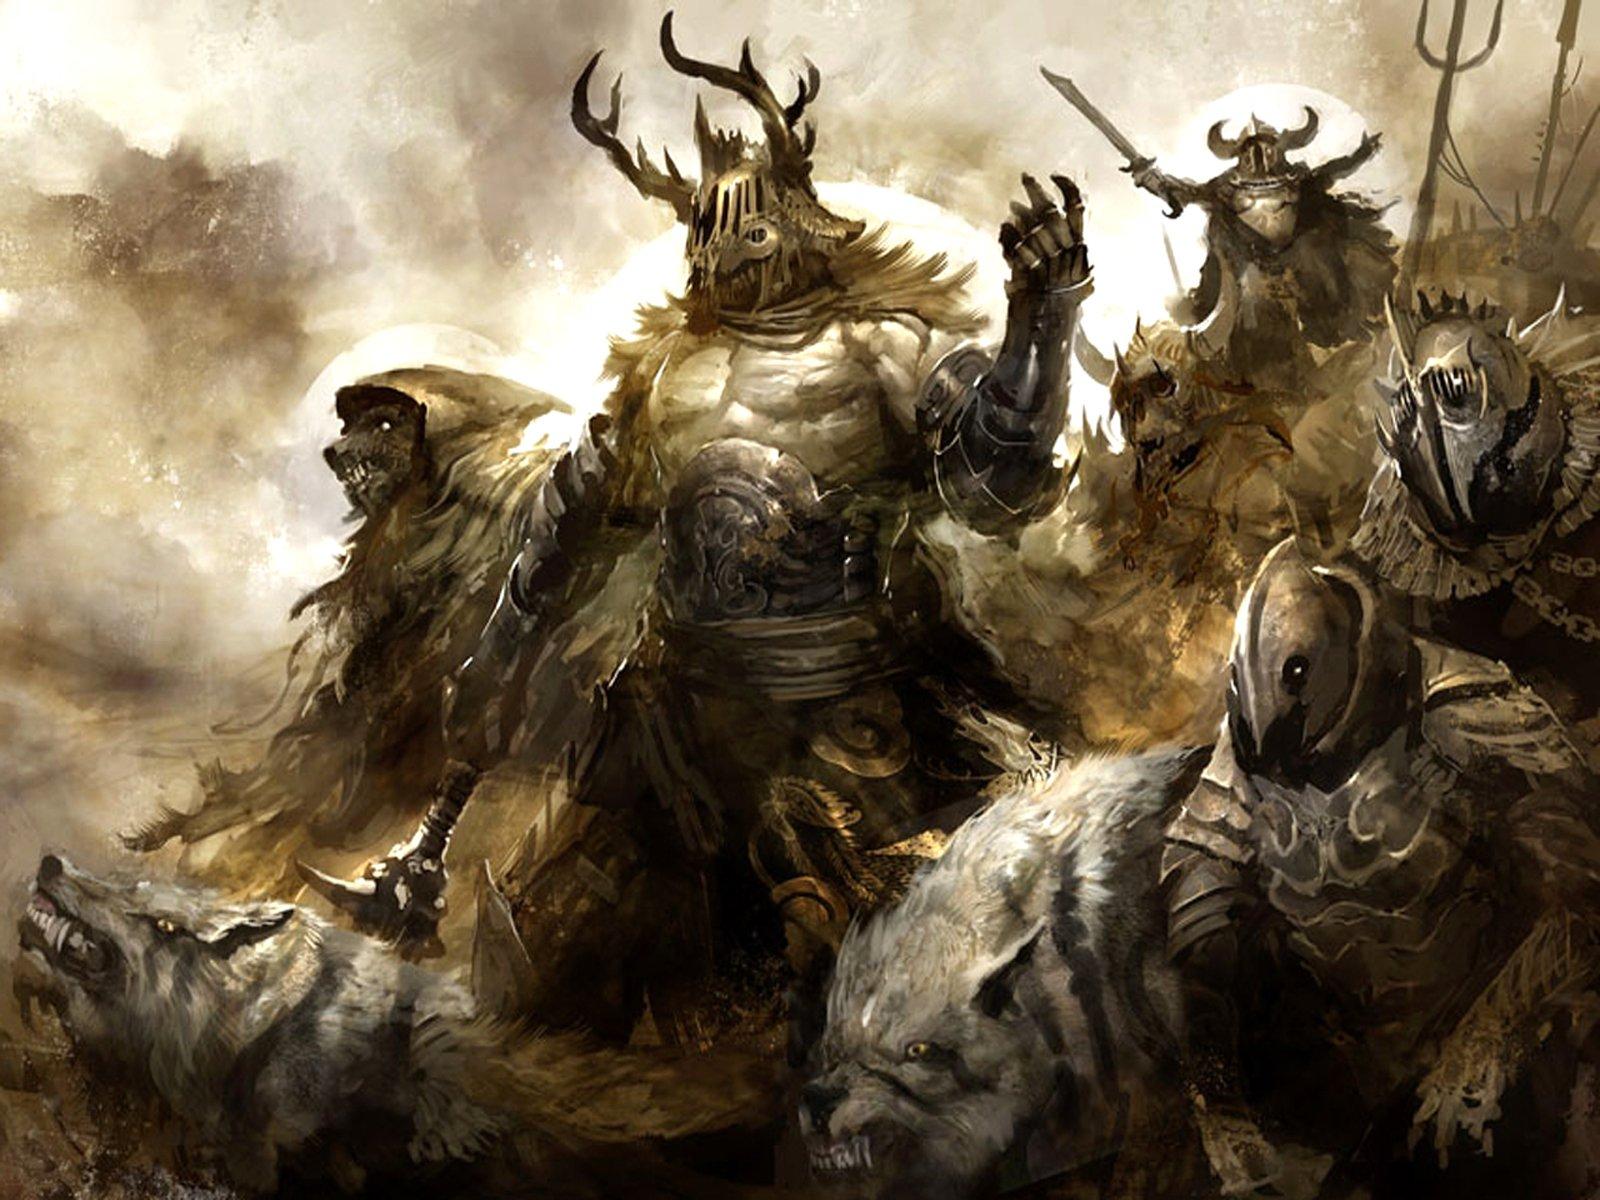 Dark Fantasy Warrior , HD Wallpaper & Backgrounds